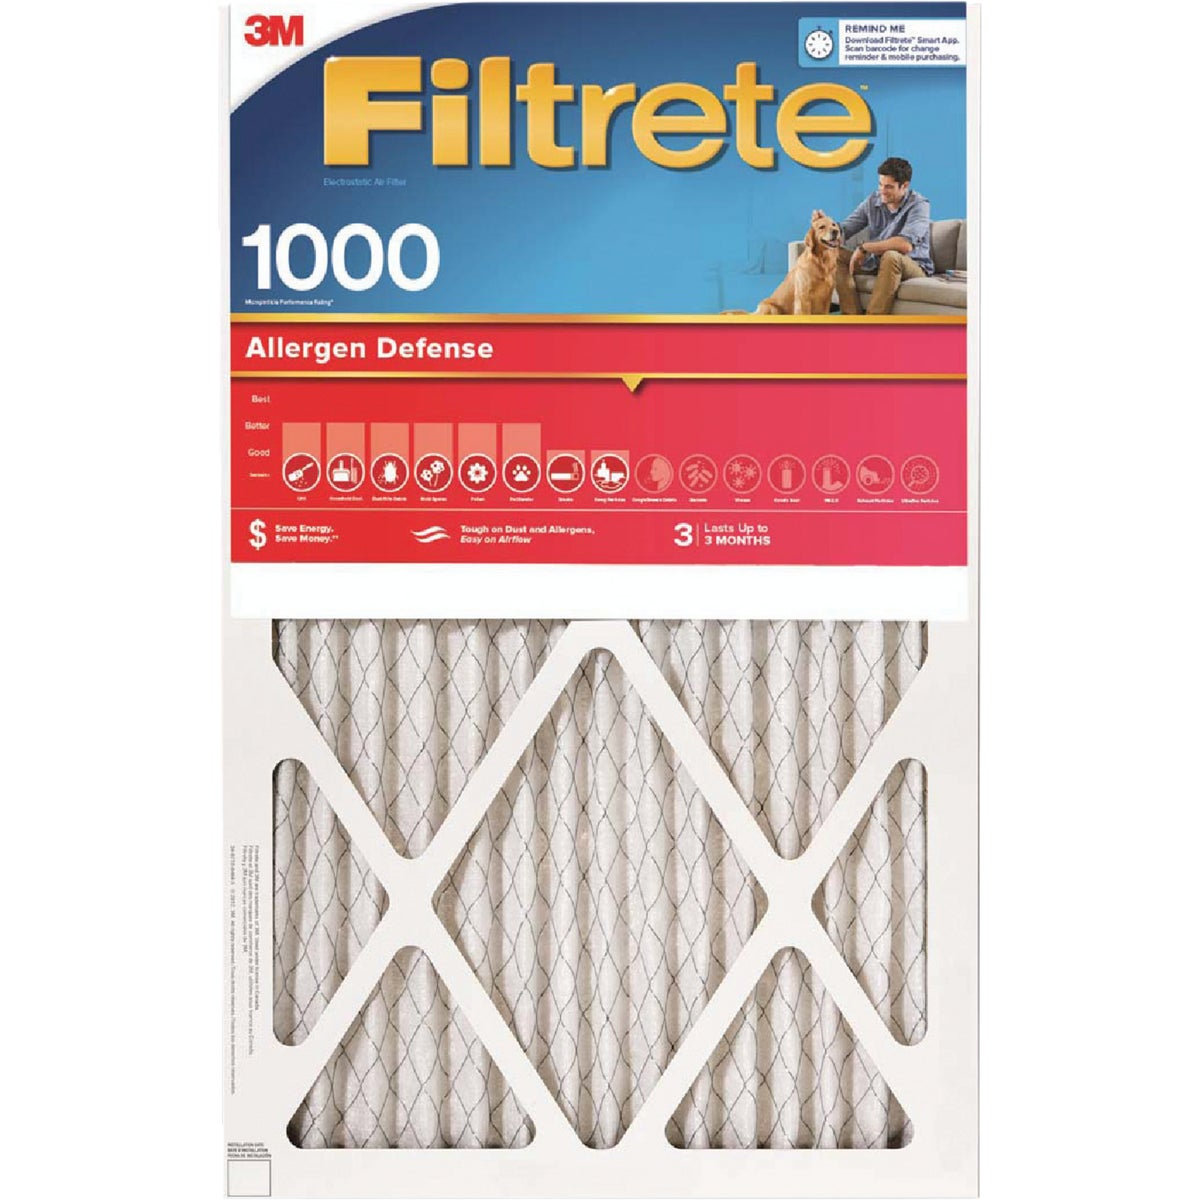 3M Filtrete 16 In. x 20 In. x 1 In. Allergen Defense 1000/1085 MPR Furnace Filter